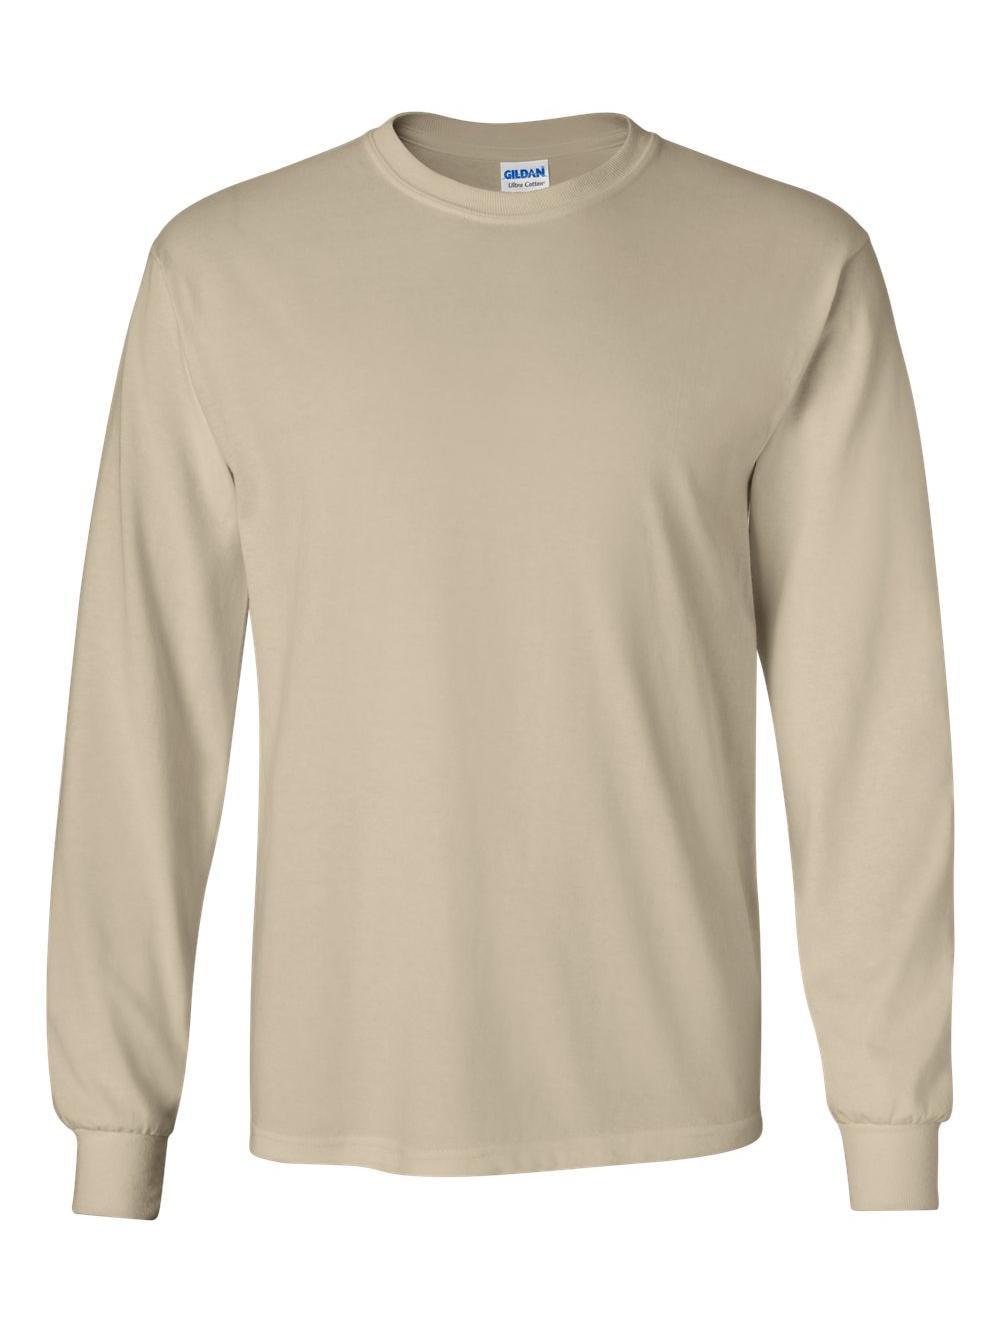 Gildan Tee Shirt 2400 6.1 oz Ultra Cotton Long Sleeve